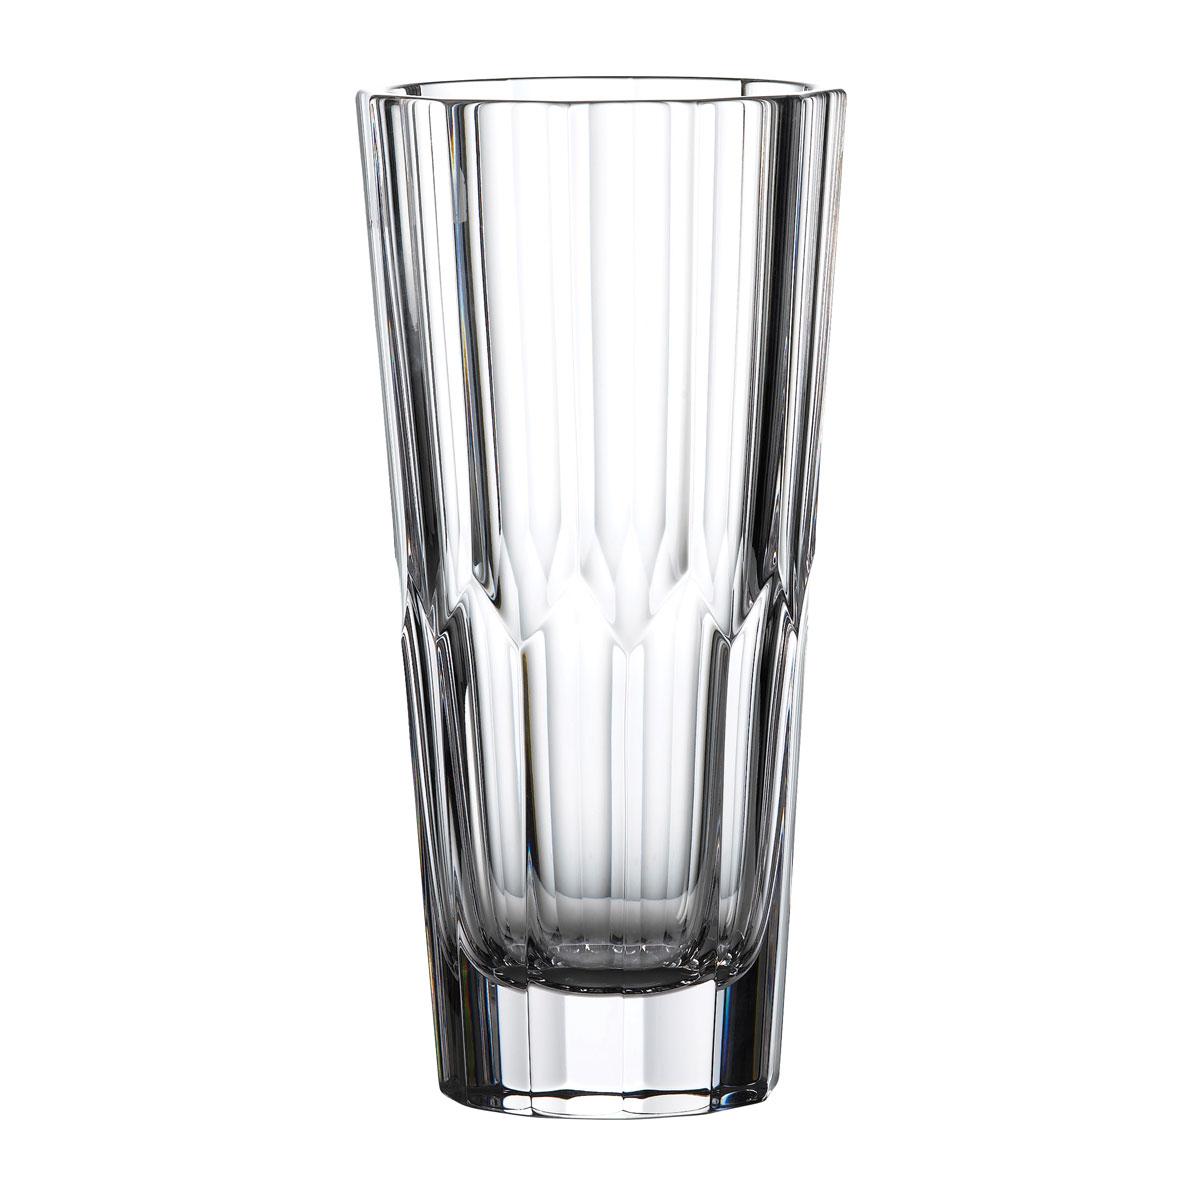 "Waterford Crystal Fleurology Jeff Leatham Icon 10"" Vase, Clear"